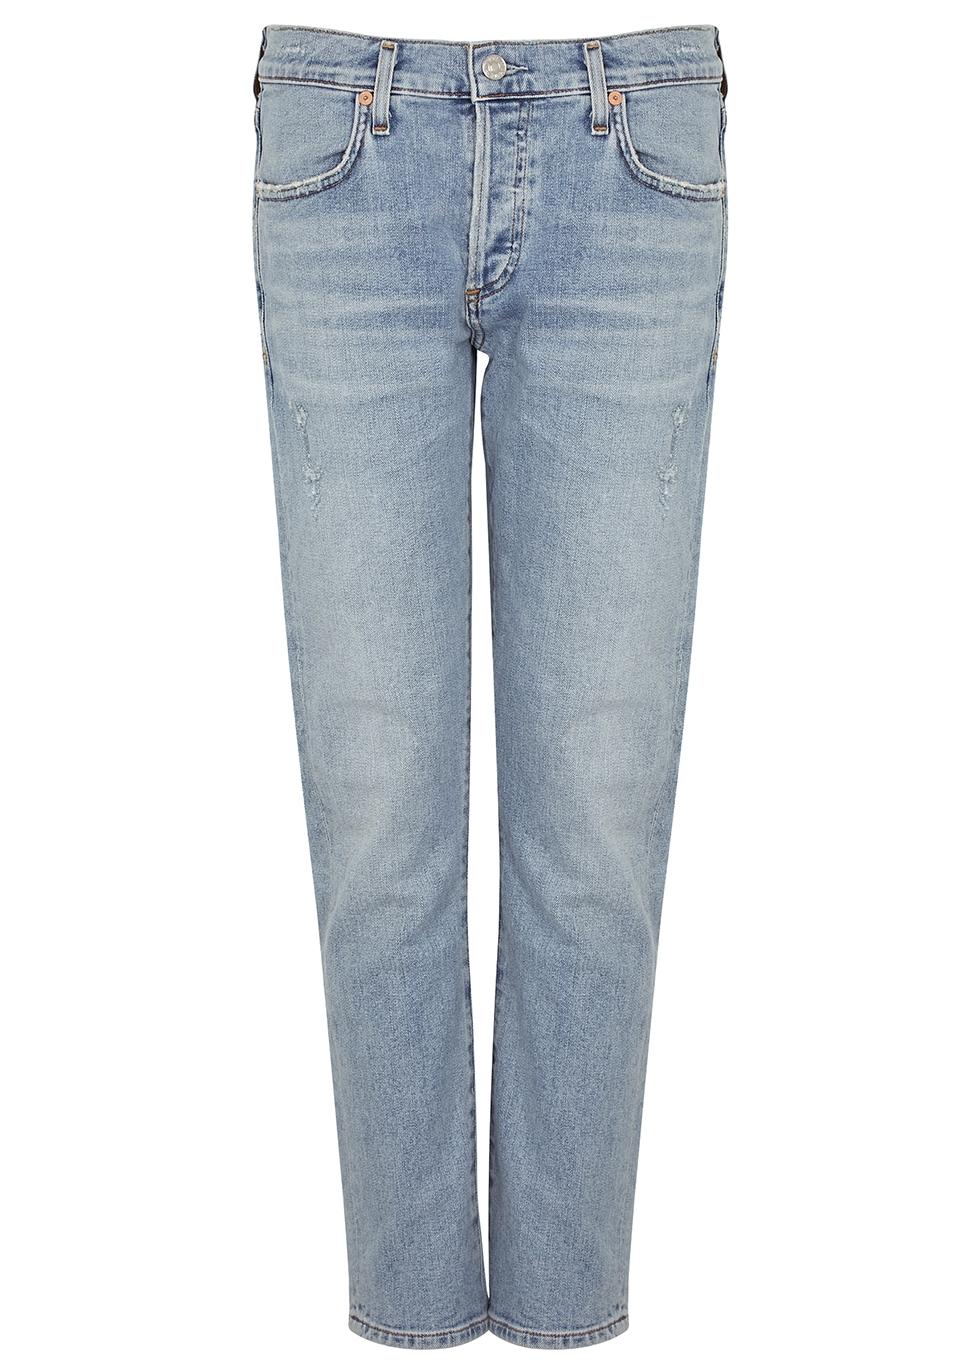 Emerson blue slim boyfriend jeans